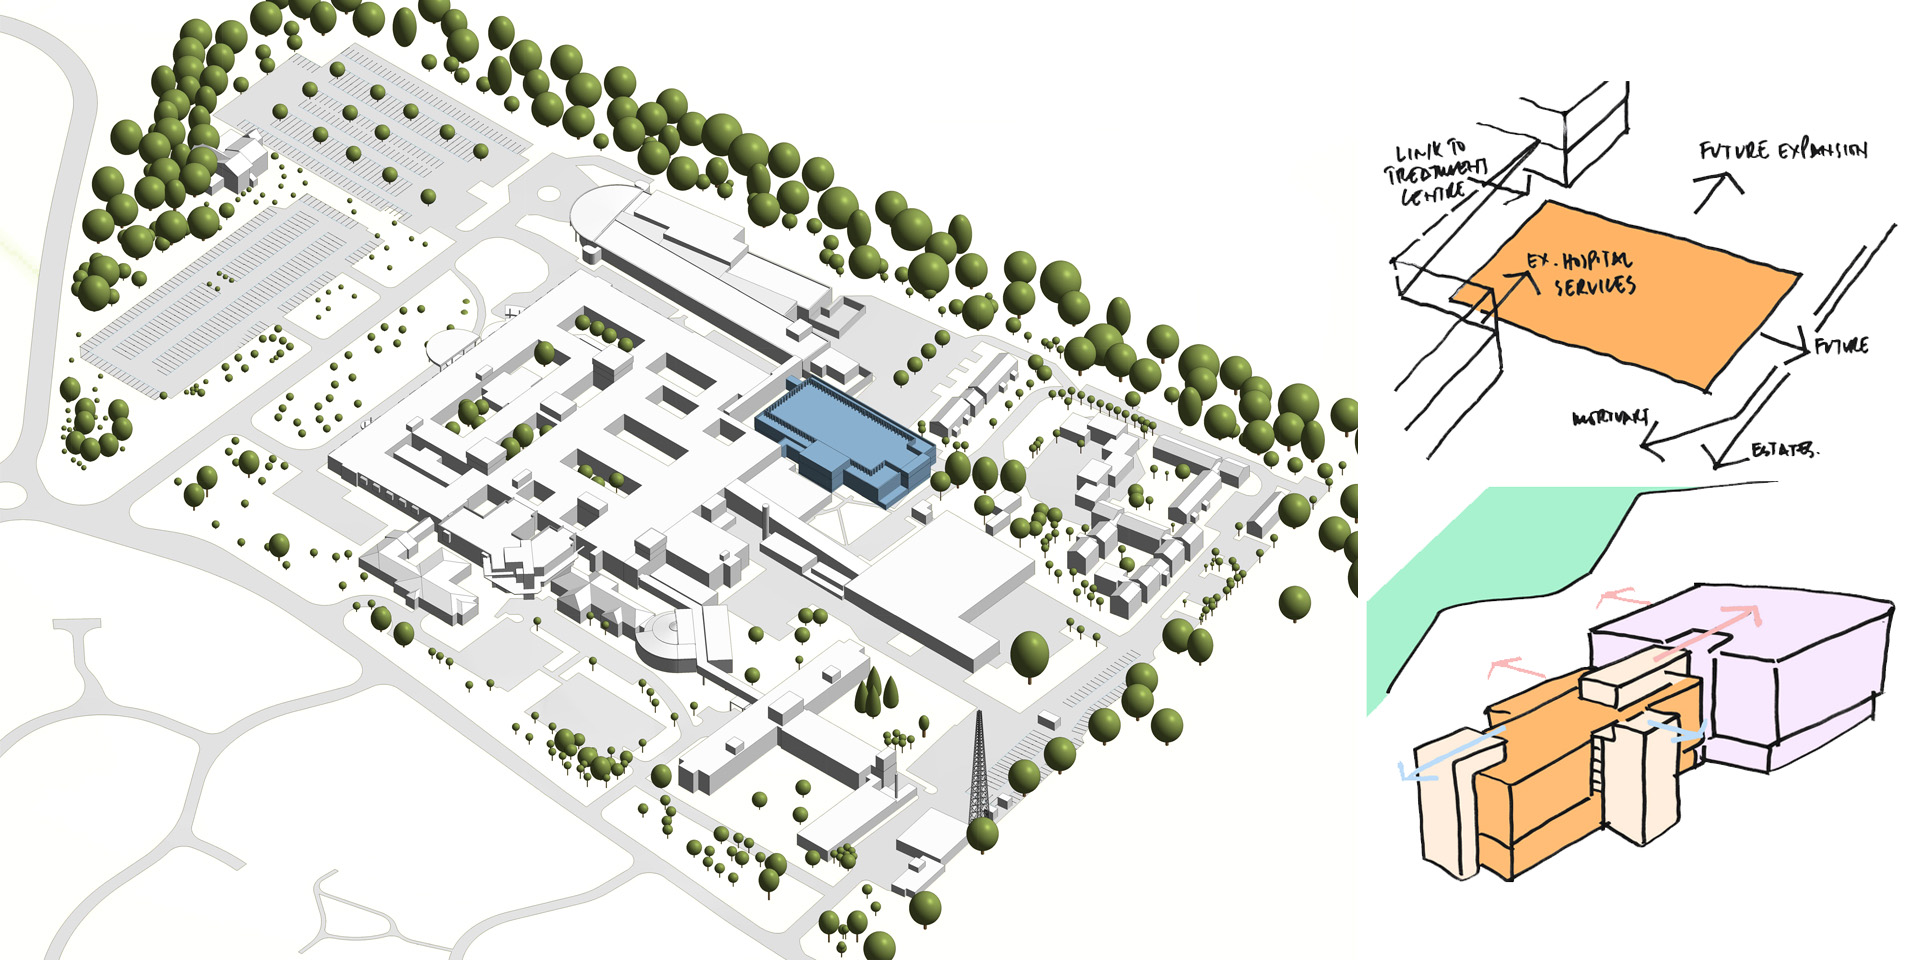 Site Plan & Sketch